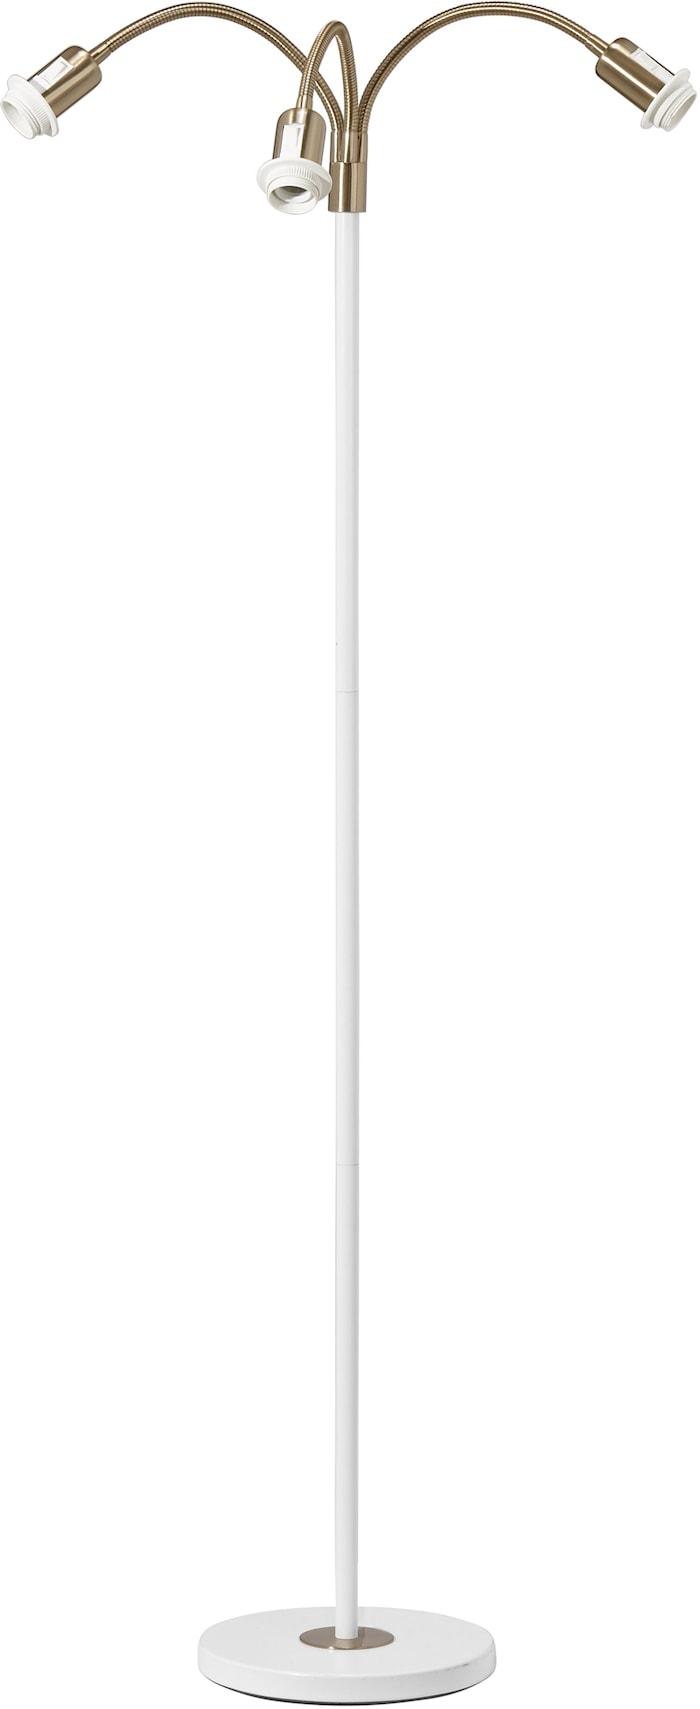 Gulvfot 3A Cia 160cm